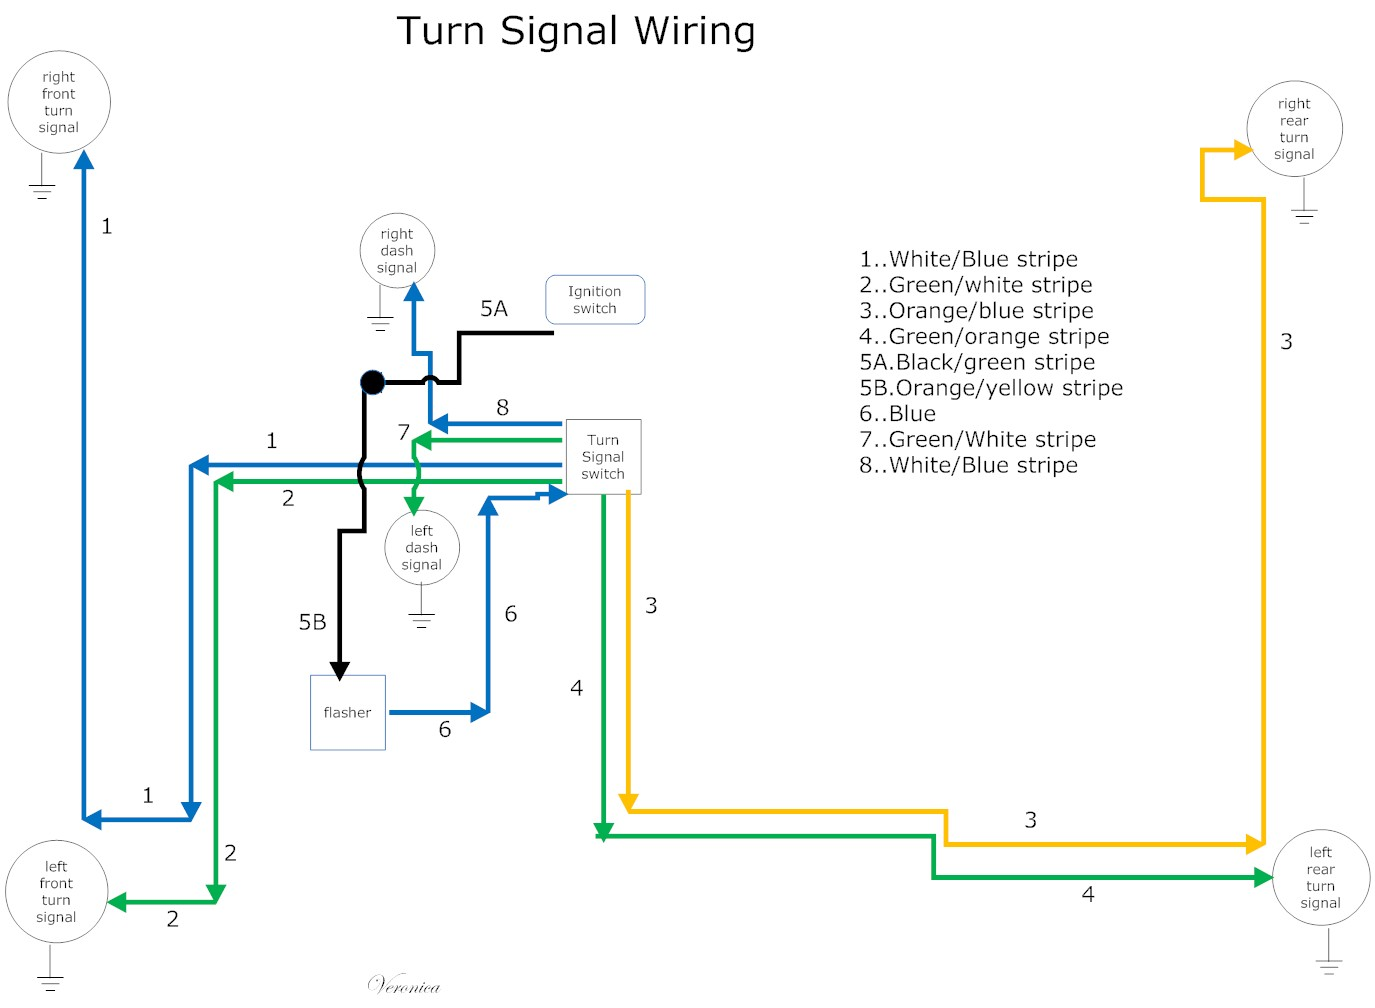 hight resolution of 2012 jeep wrangler turn signal wiring diagram somurich com rh somurich com jeep cj7 turn signal